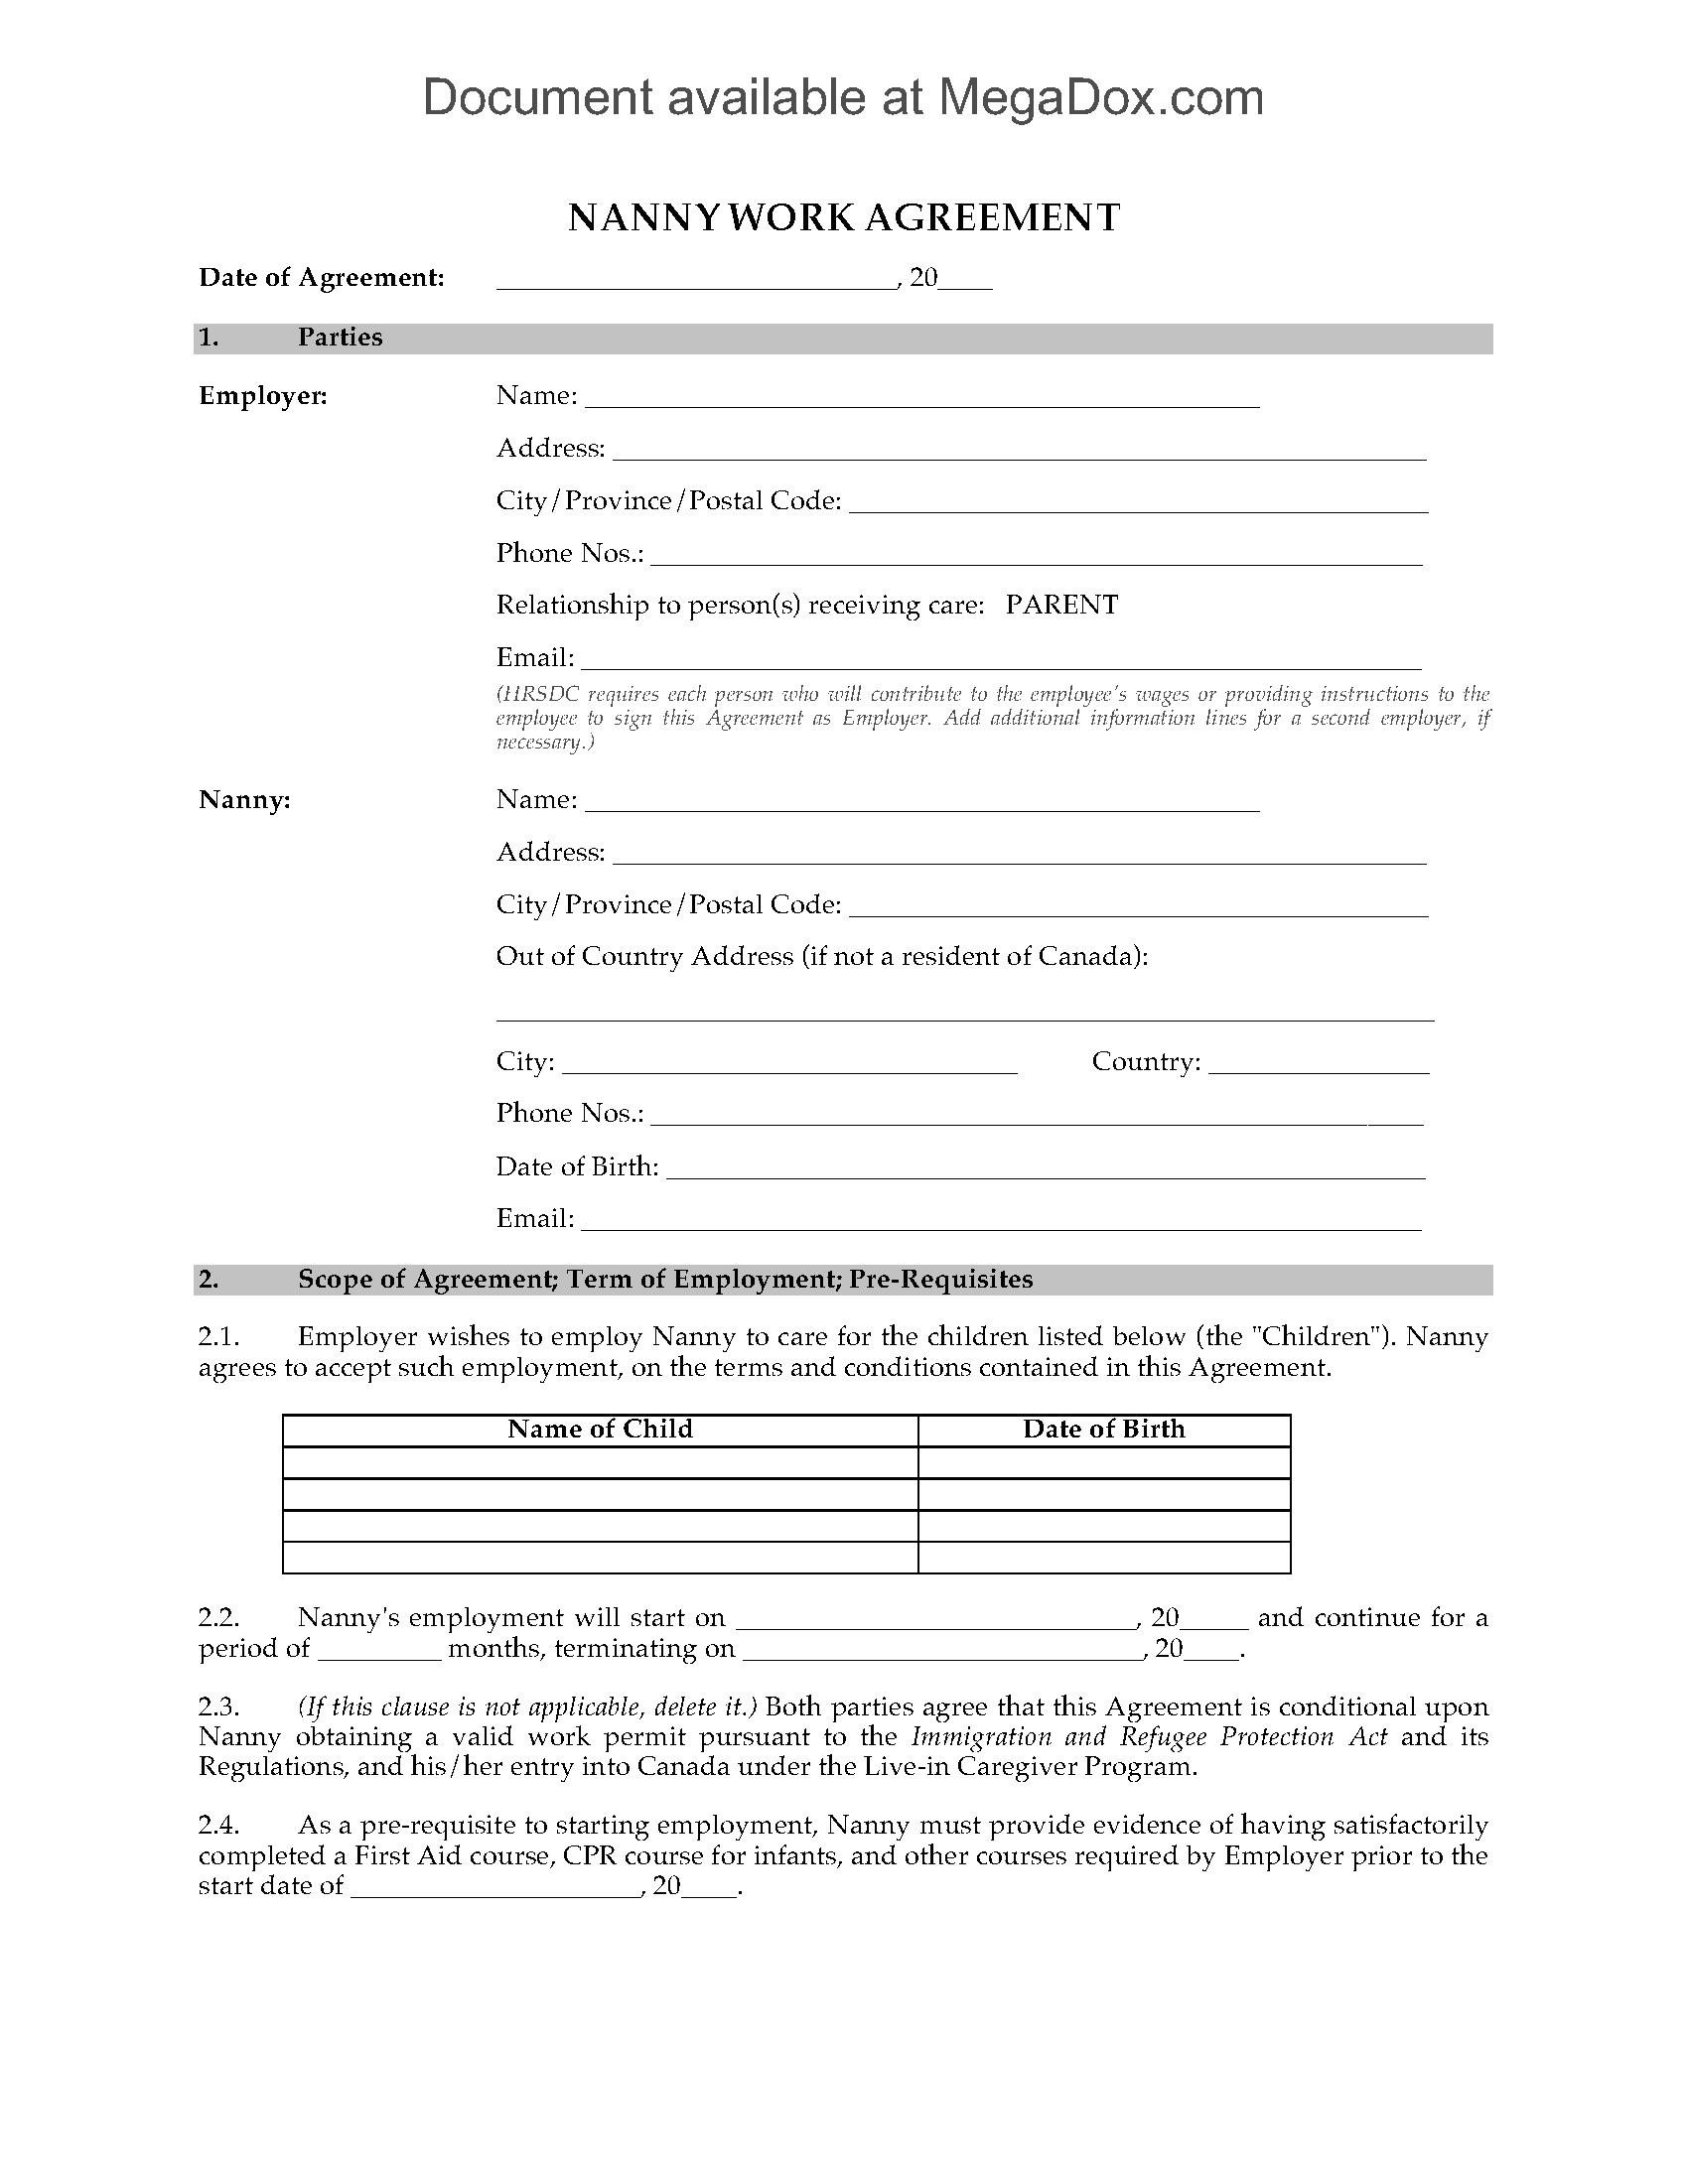 canada nanny employment agreement